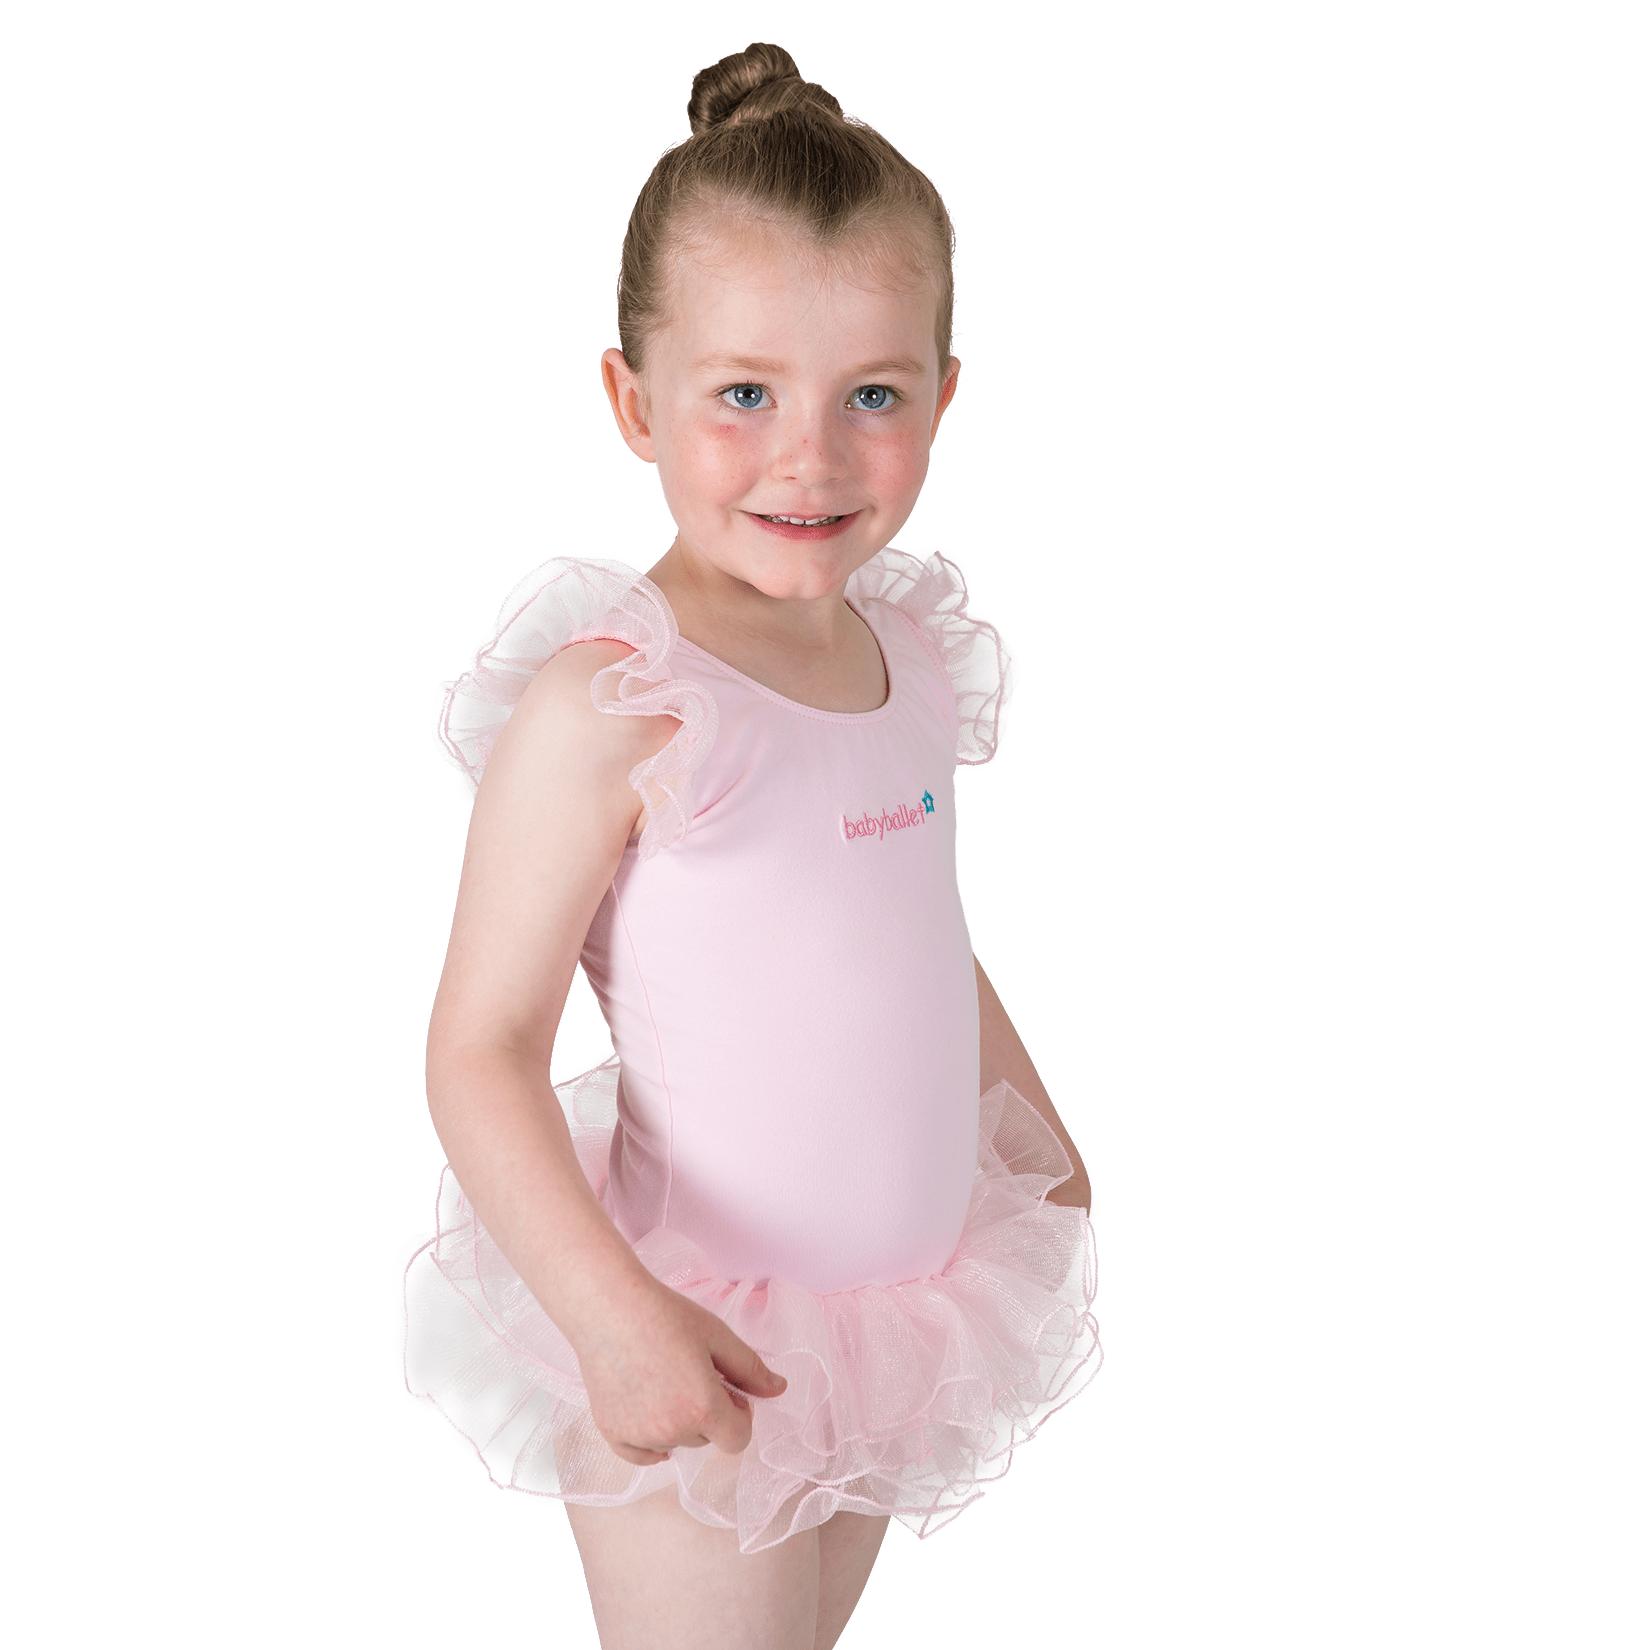 08624aab30 baby ballet twinkle tutu entry level tutu my first tutu